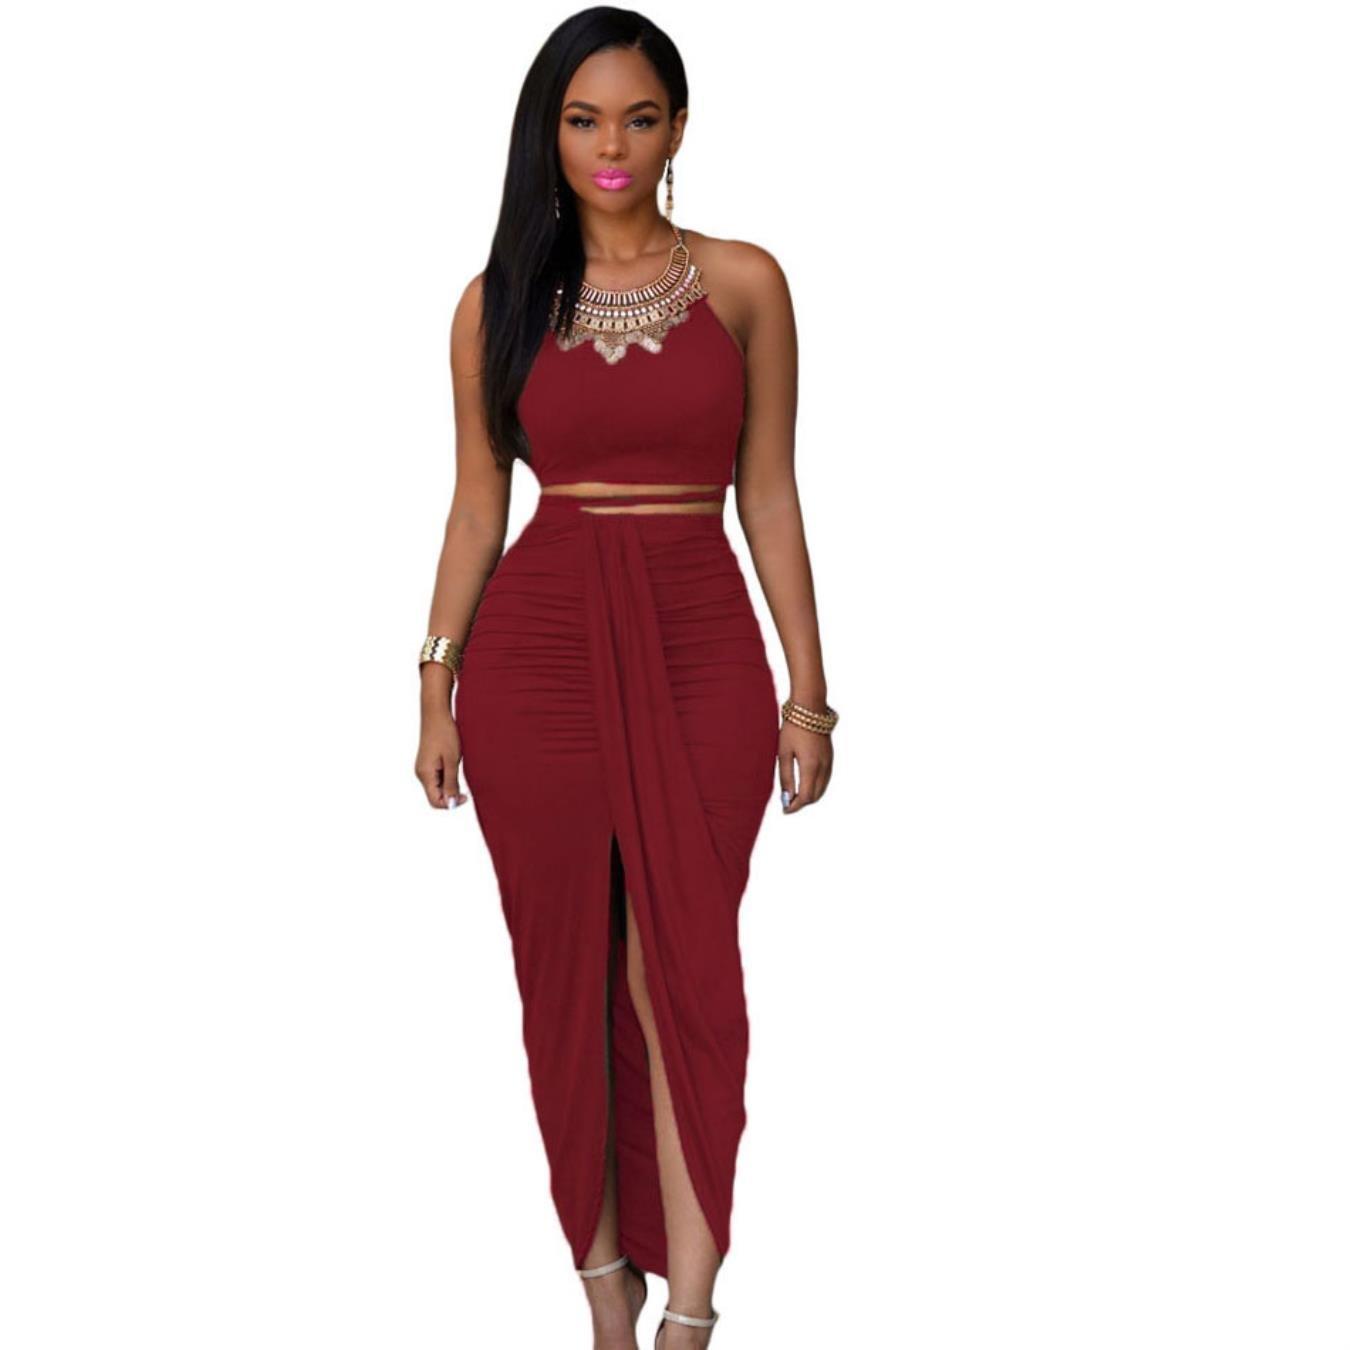 cbce95871458 JESRKAS Women Two Piece Maxi Dress 2018 Summer Slit Draped Long Dress Club  Party Bodycon Sexy Dresses at Amazon Women s Clothing store